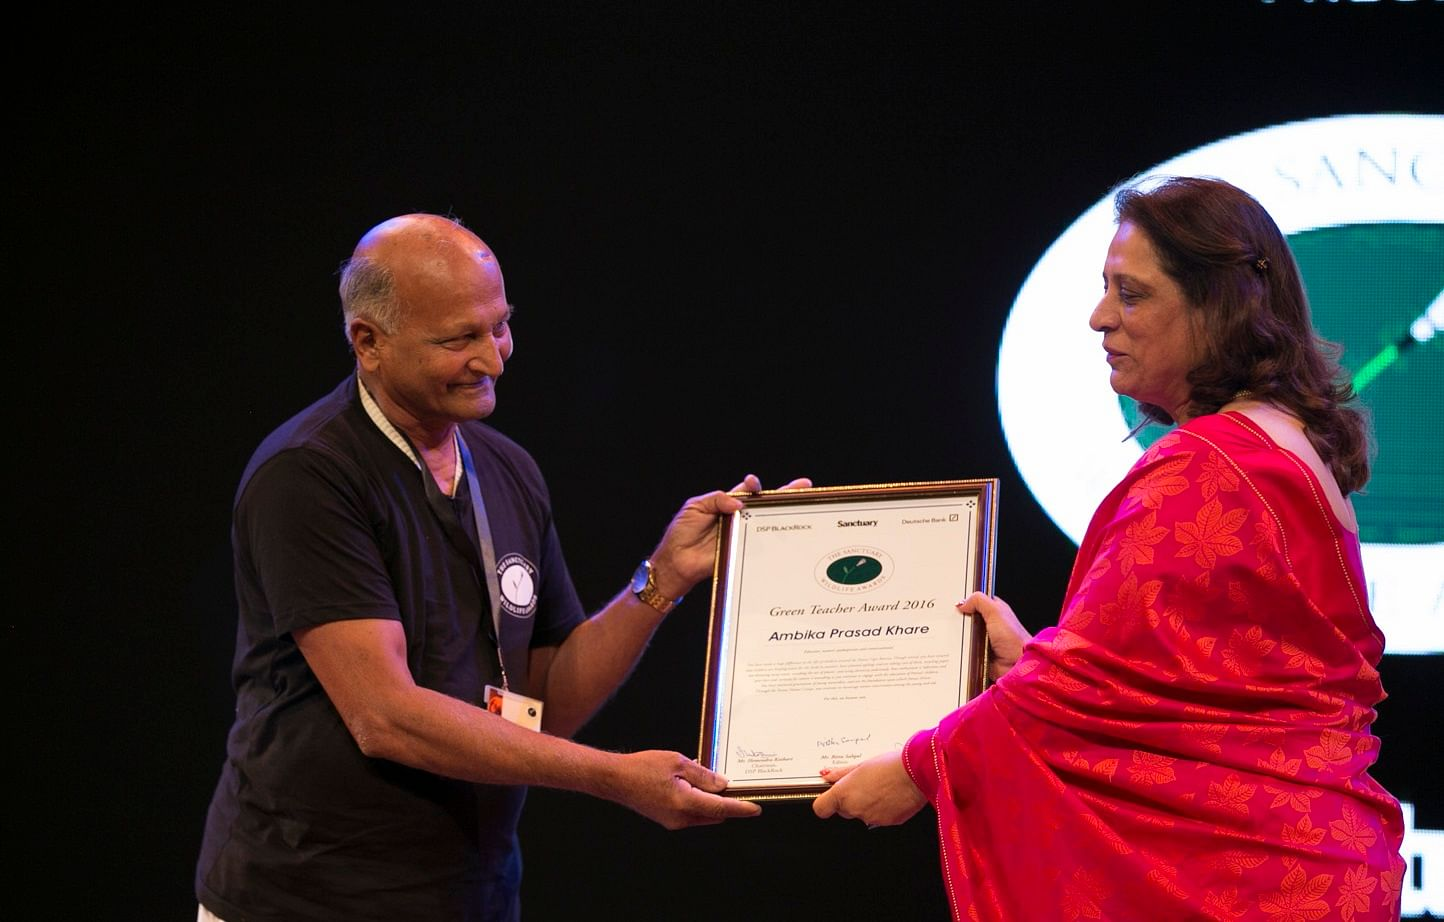 sanctuary-wildlife-awards-2016-ncpa-0824-2